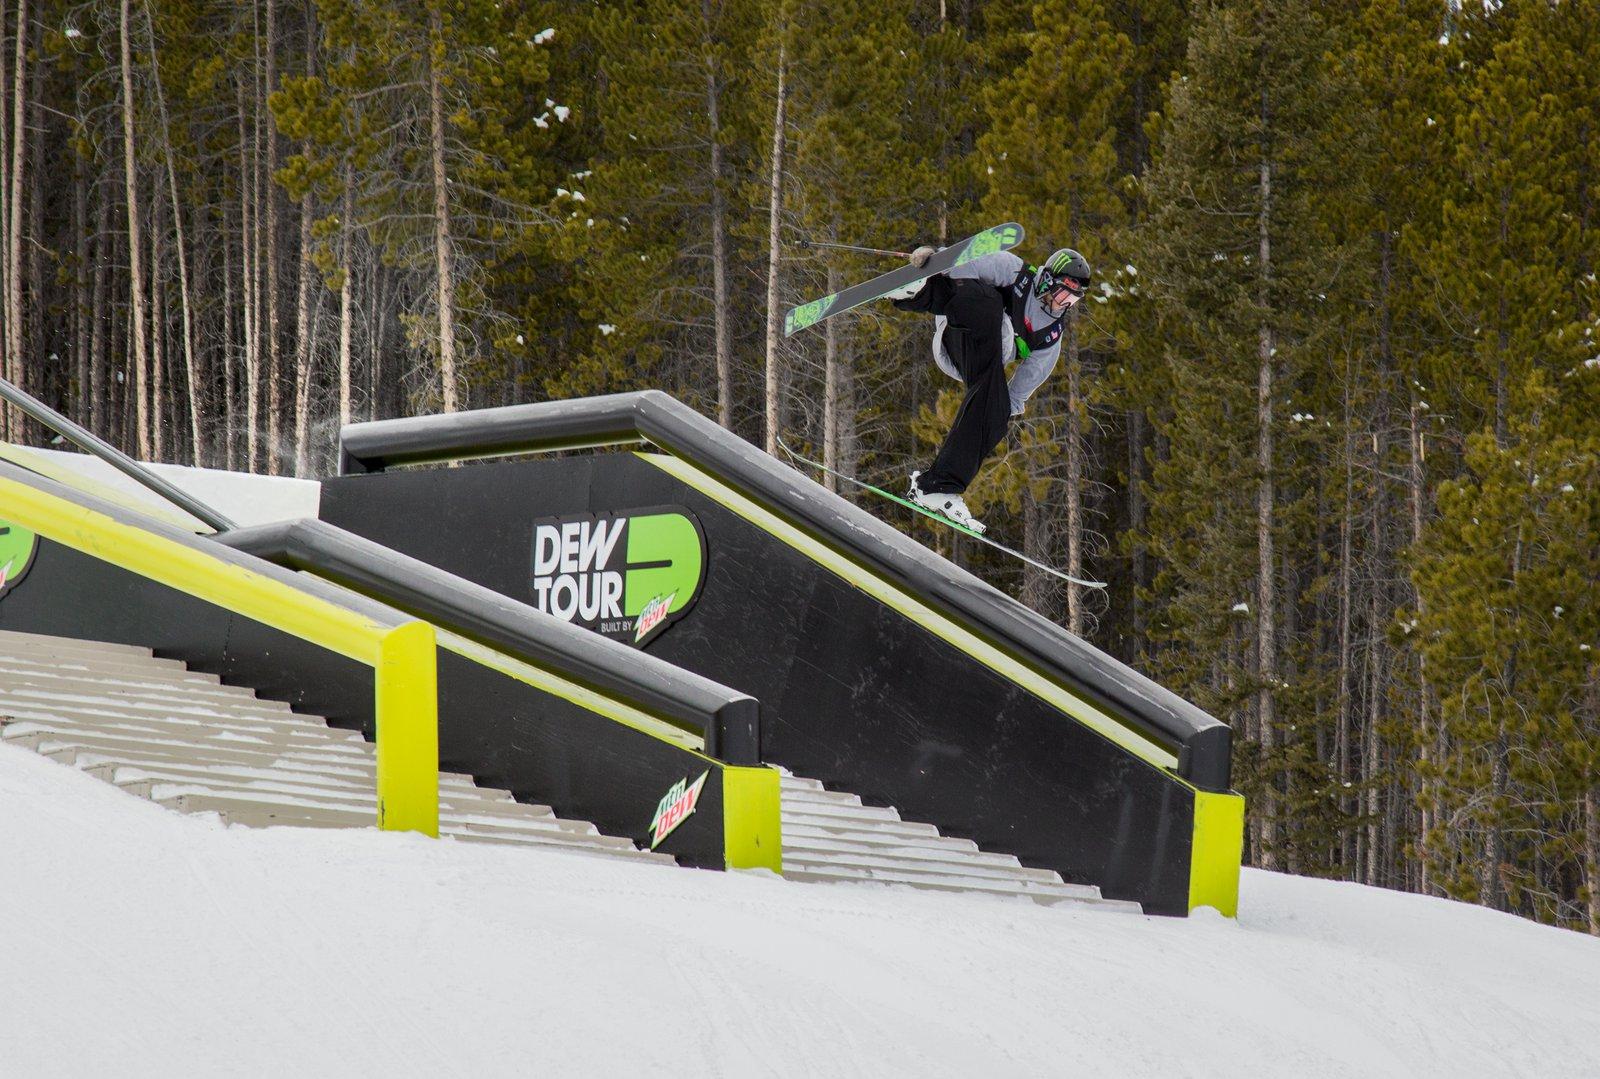 Henrik Harlaut Lip Rodeo 4 on to Backslide | Dew Tour